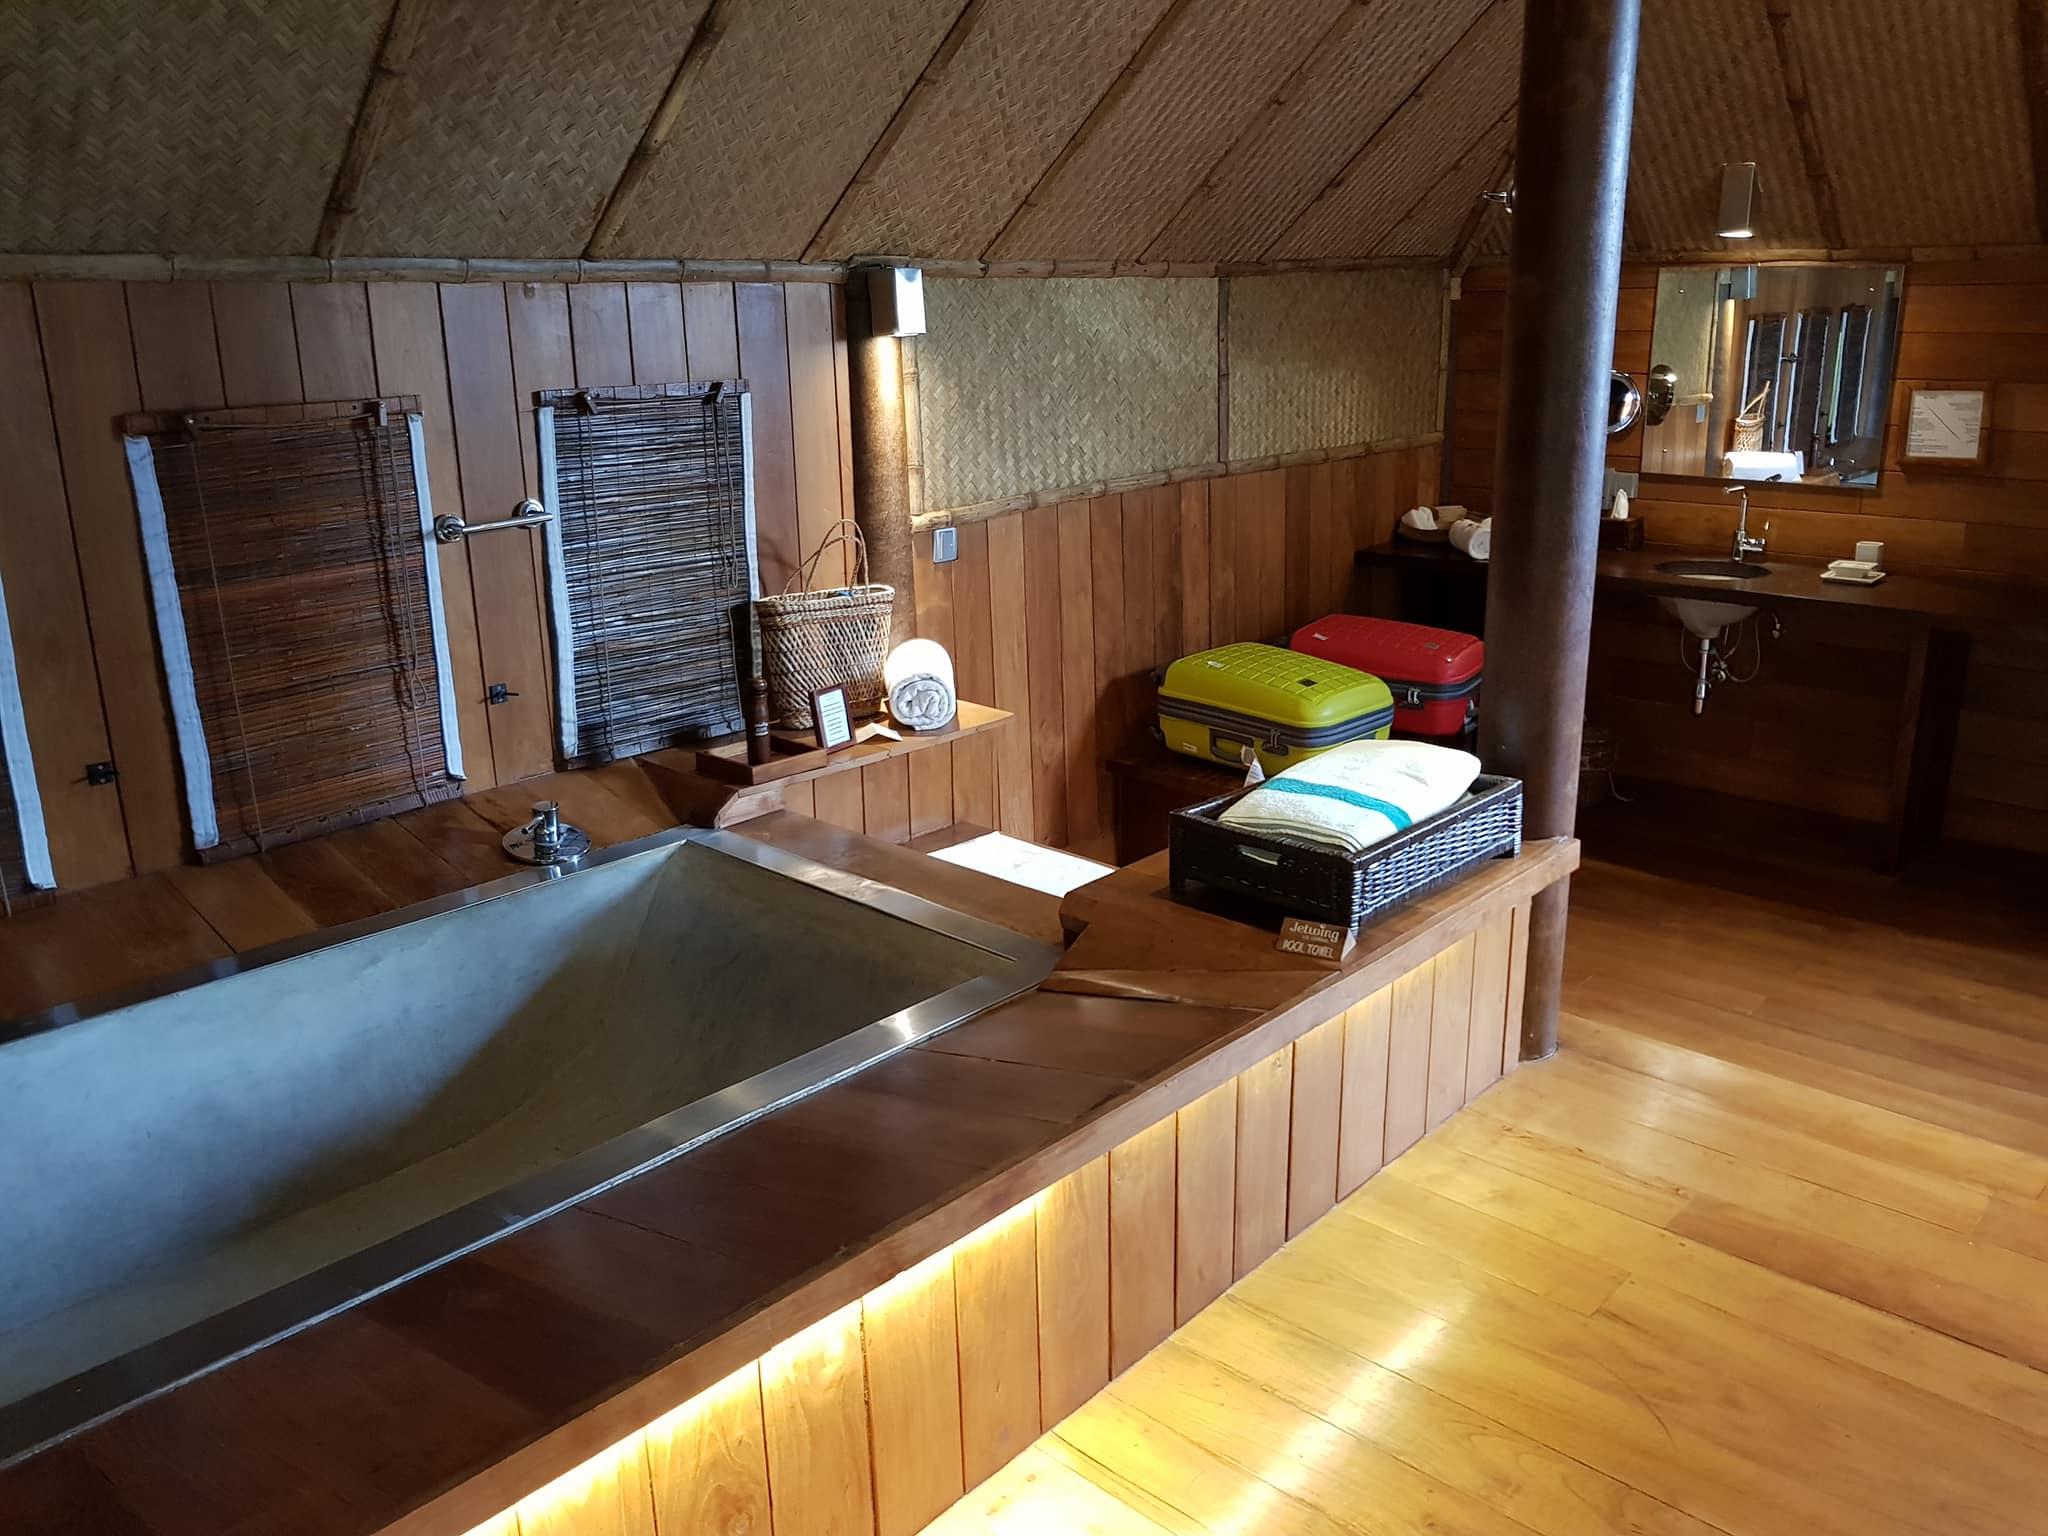 invite-to-paradise-sri-lanka-maldives-holiday-honeymoon-specialists-customer-guest-feedback-zane-lisa-butcher-jetwing-vil-uyana-hotel-sigiriya-cultural-triangle-bath.jpg